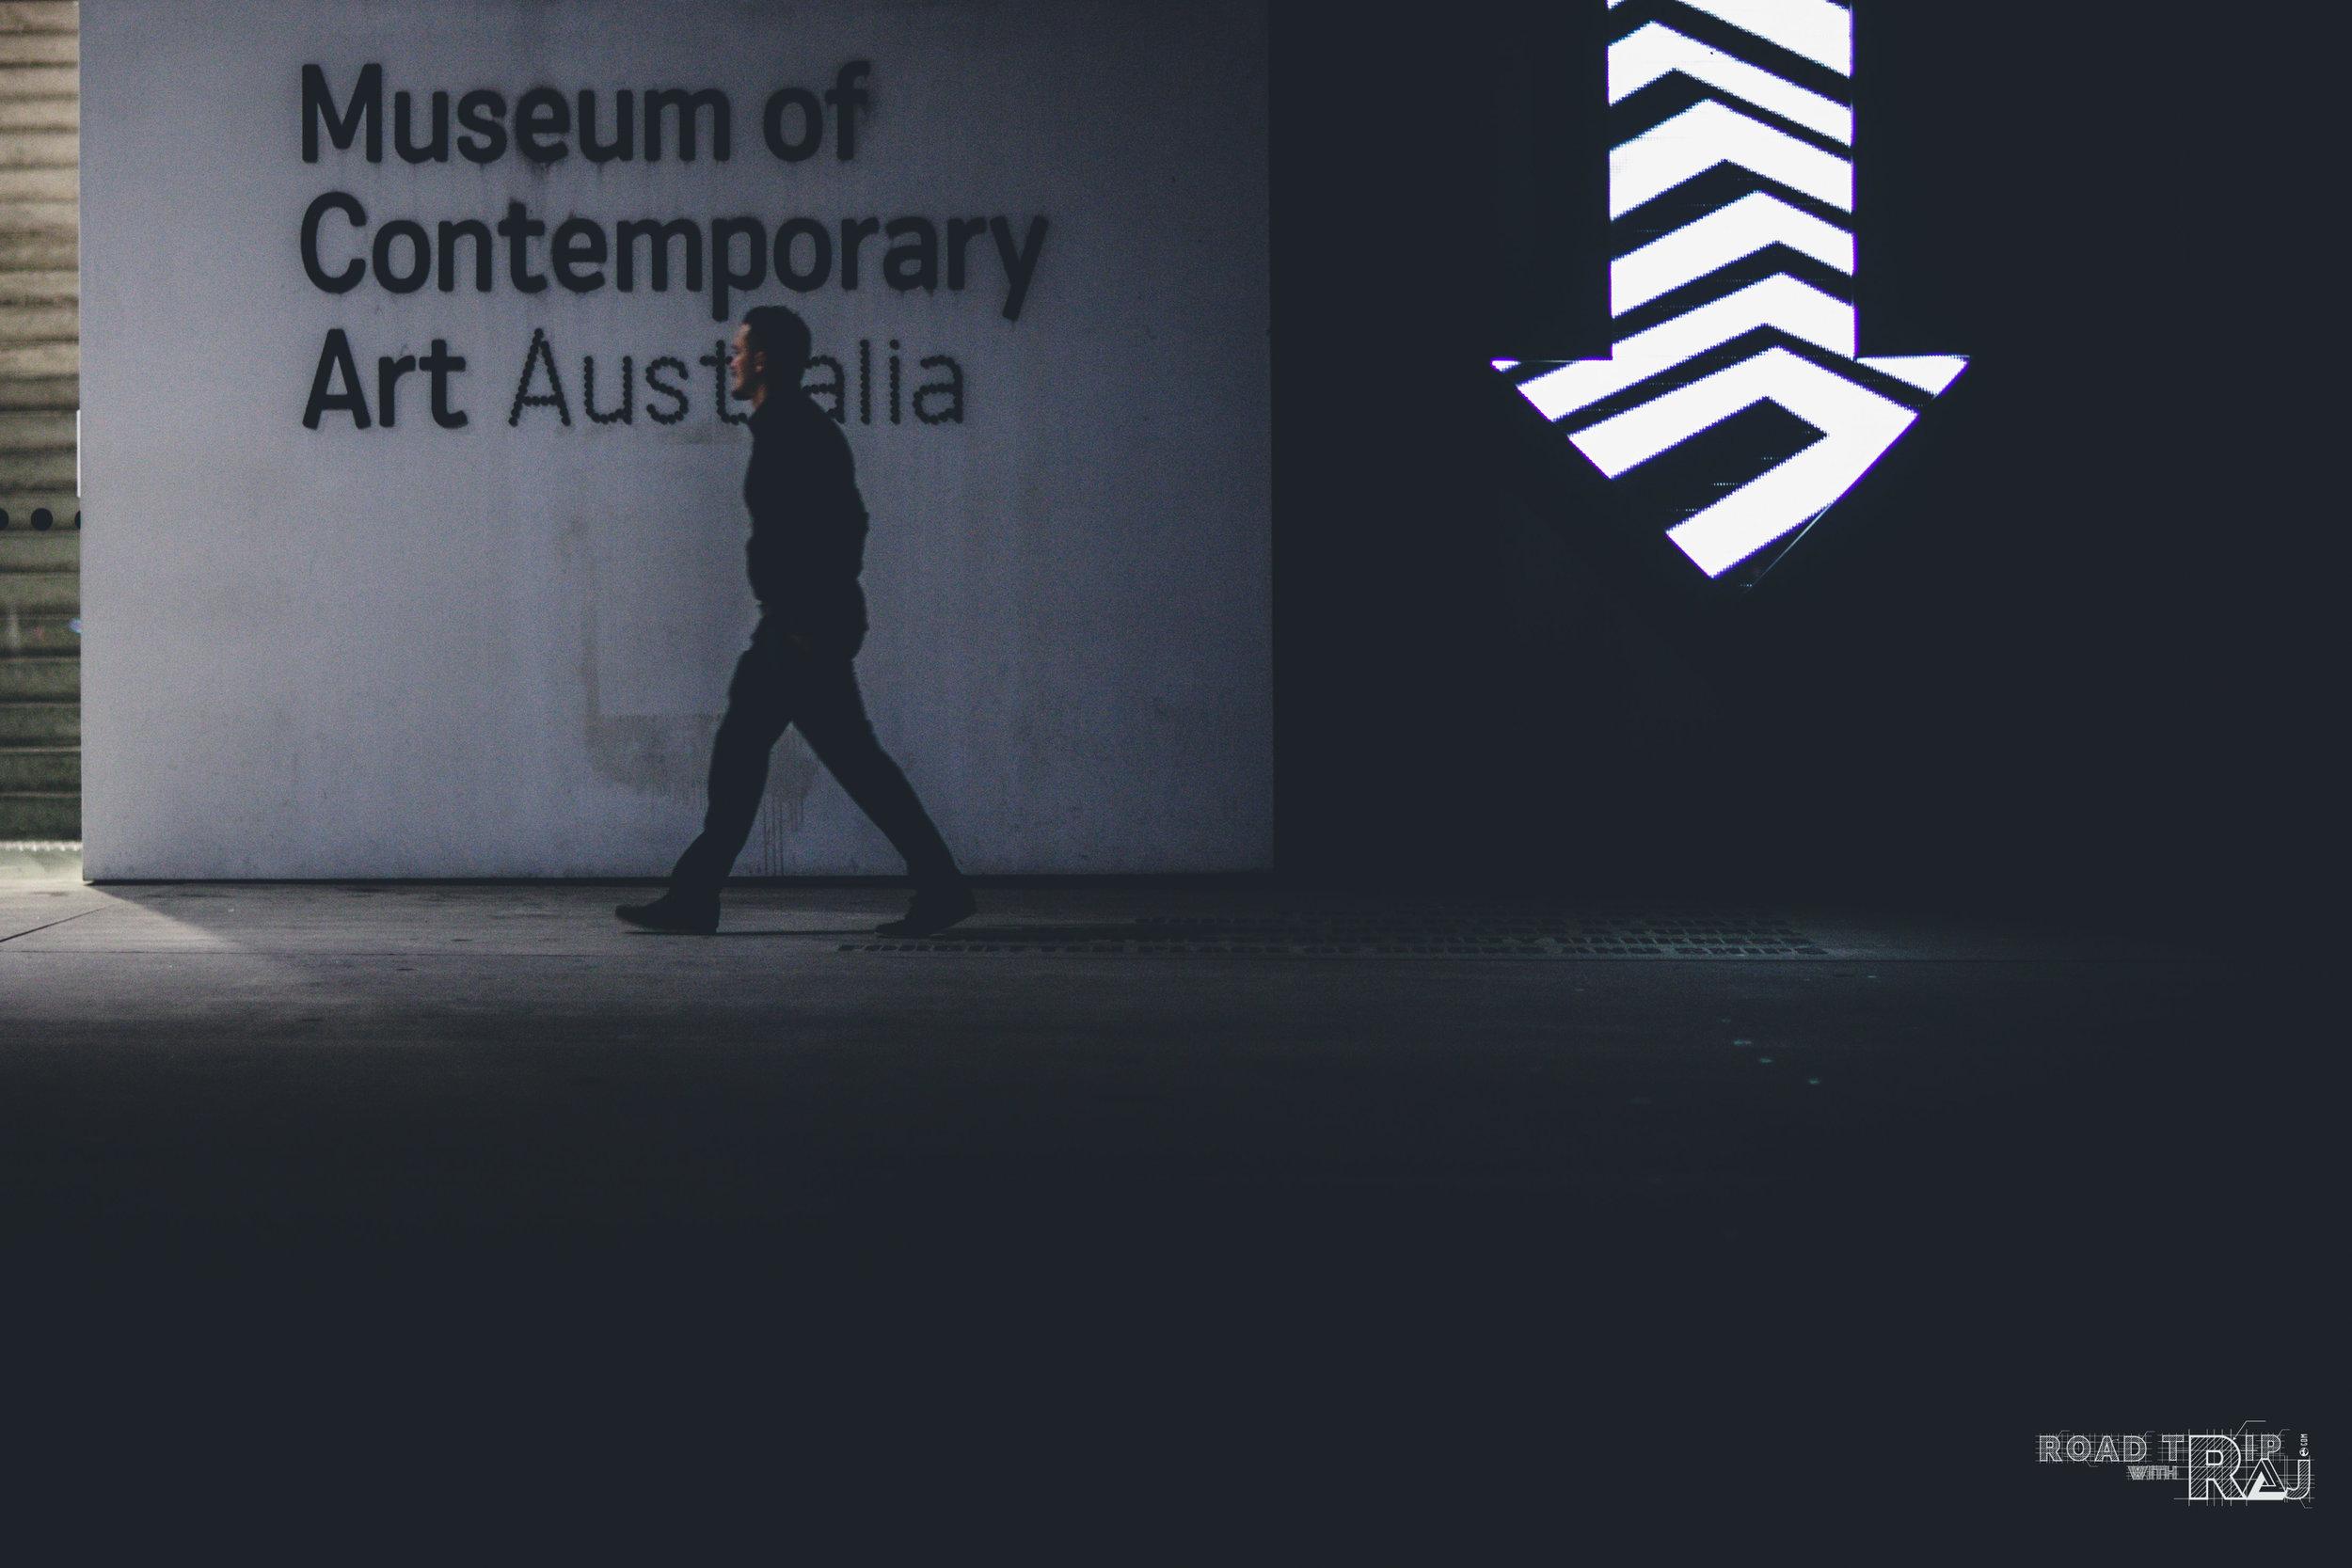 museum-of-contemporary-art-australia-sydney.jpg